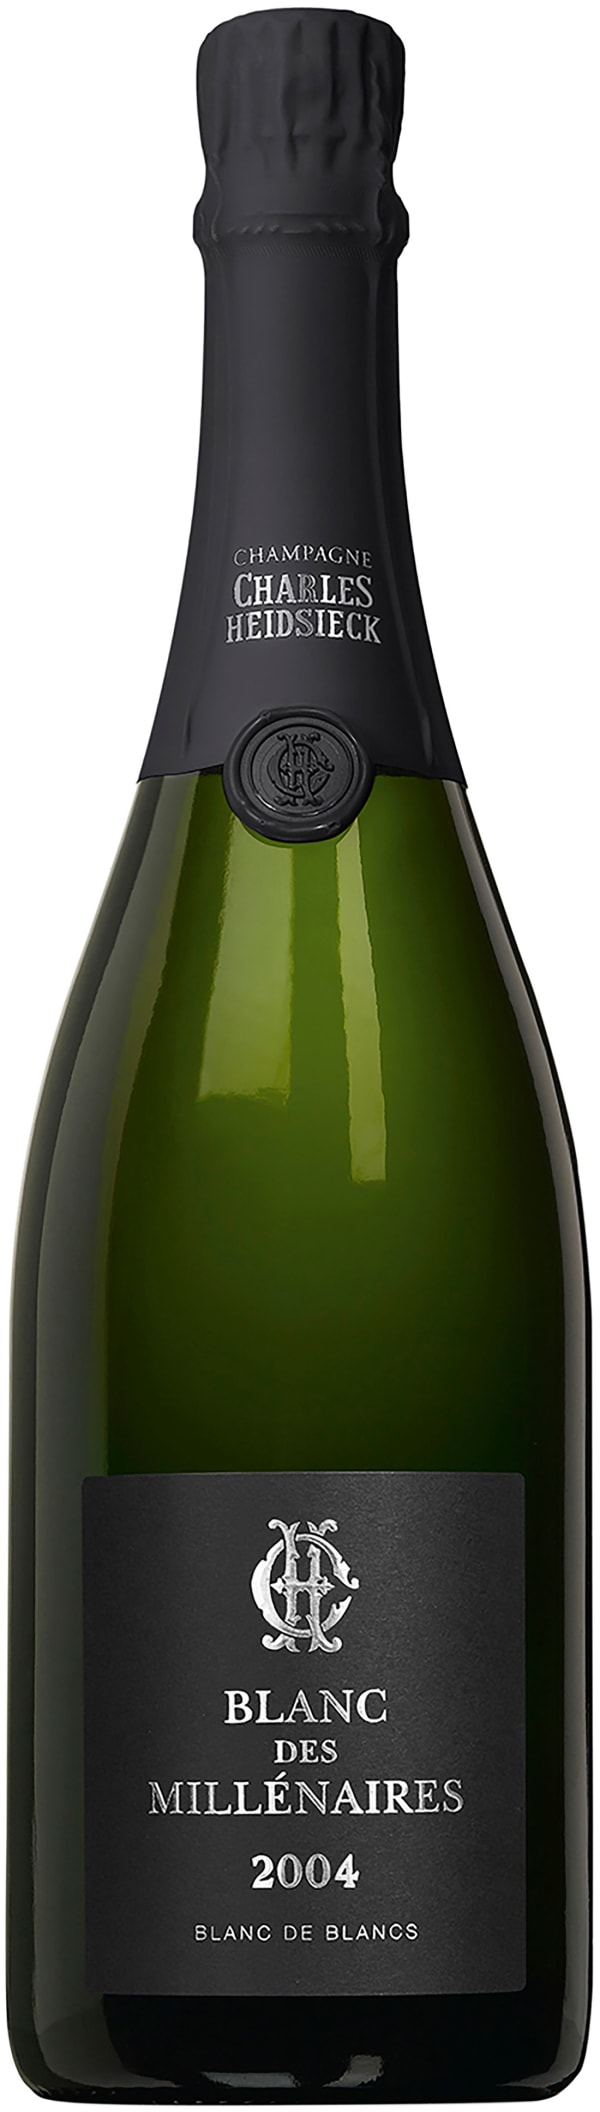 Charles Heidsieck Blanc des Millenaires Champagne Brut 2004